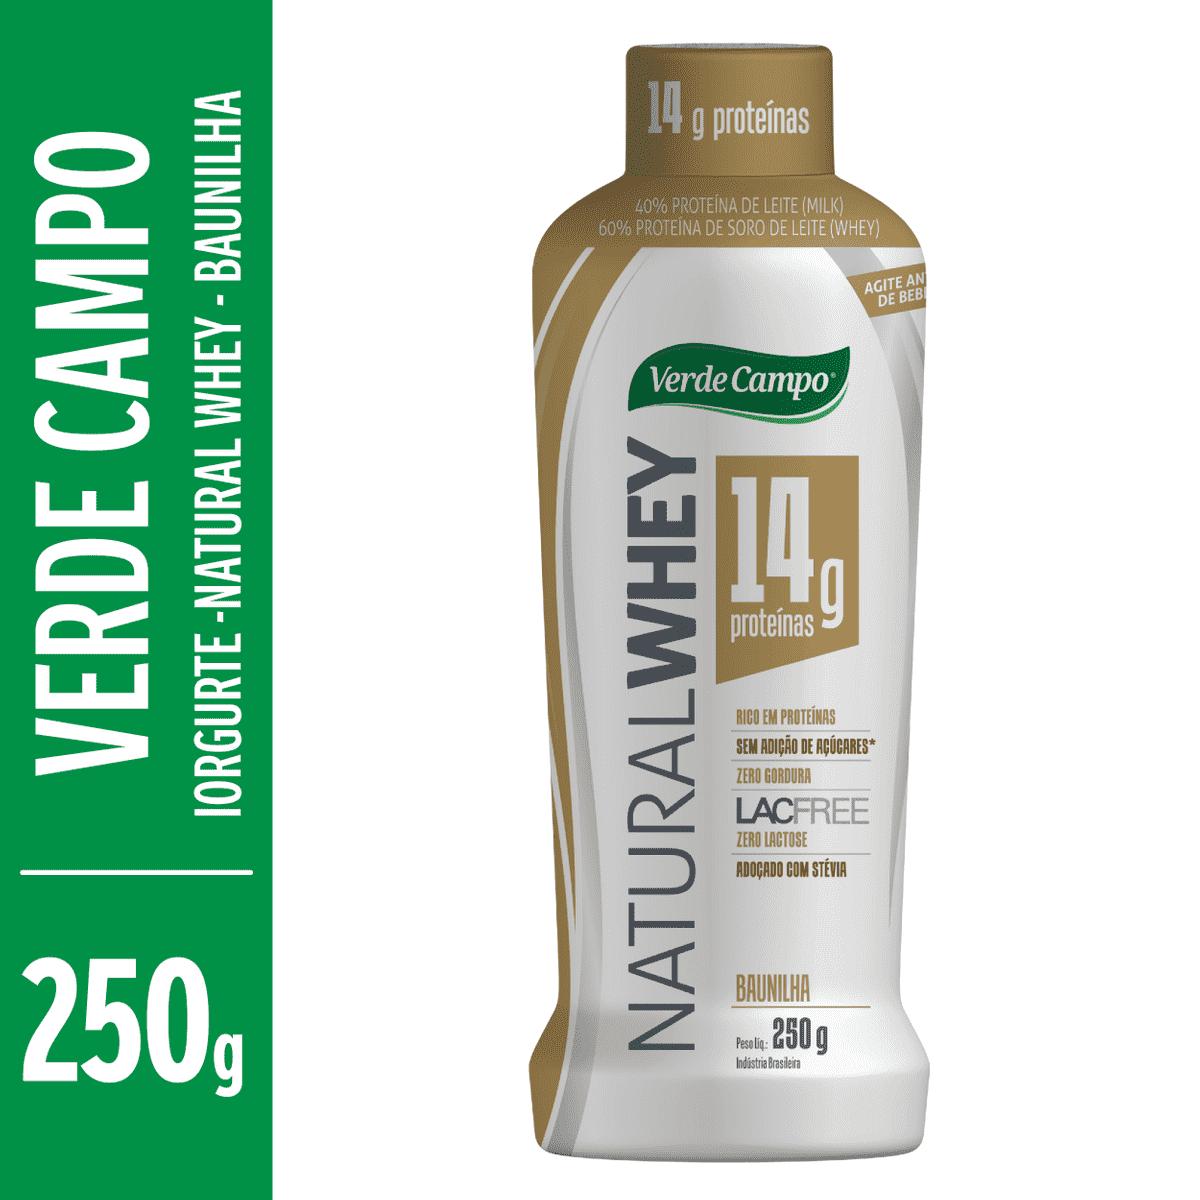 97dde24f1 Iogurte Lacfree Natural Whey de Baunilha VERDE CAMPO 250g